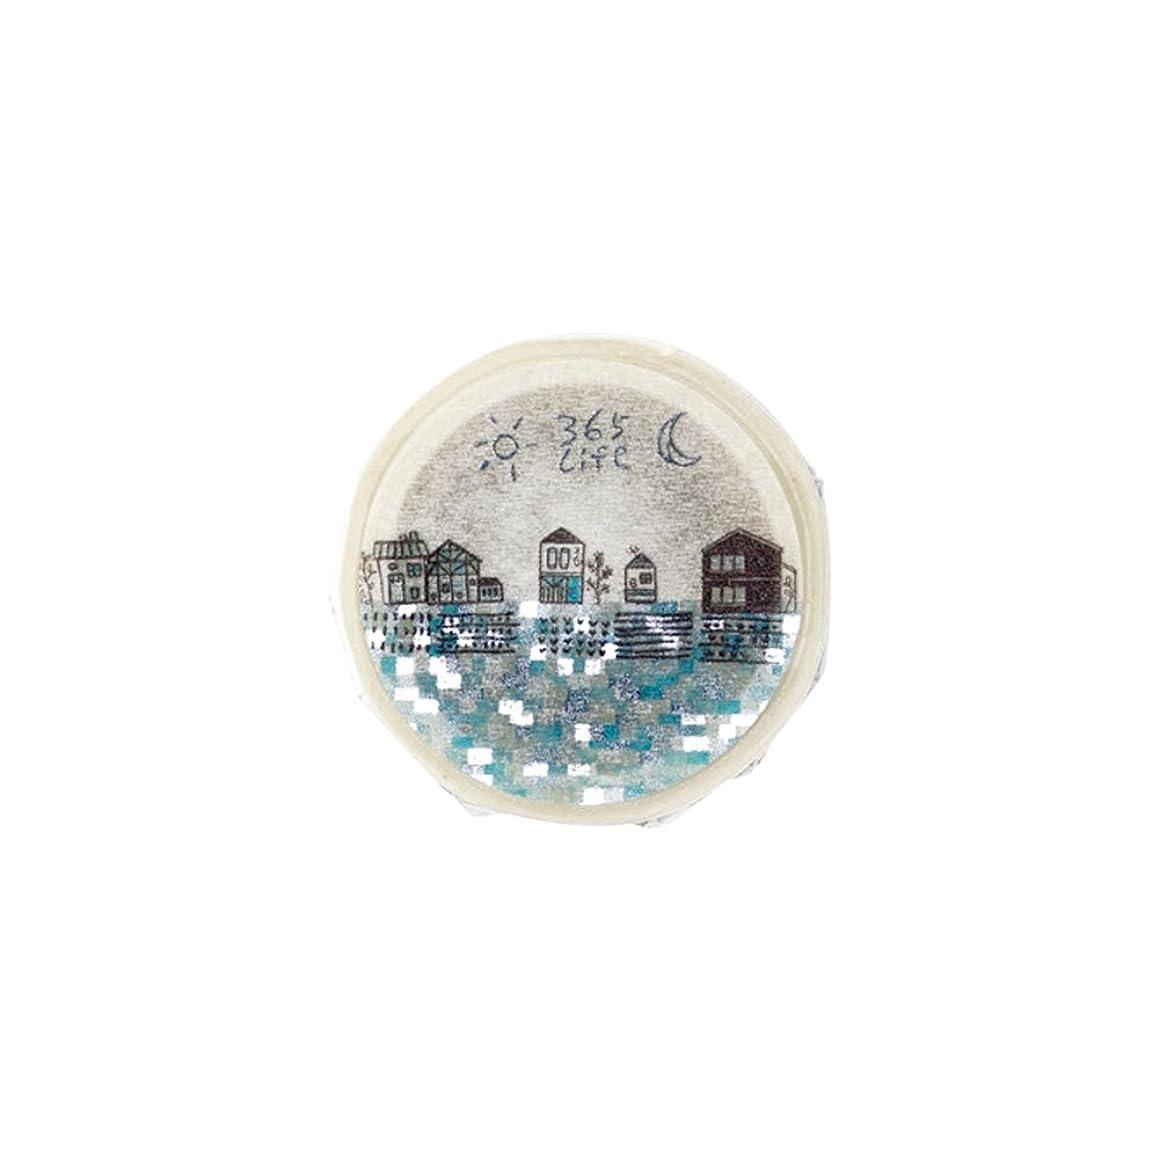 Roundtop Designer's Washi Masking Tape 20mm x 10m, Syoukei, On The Road (MTW-1307-002)